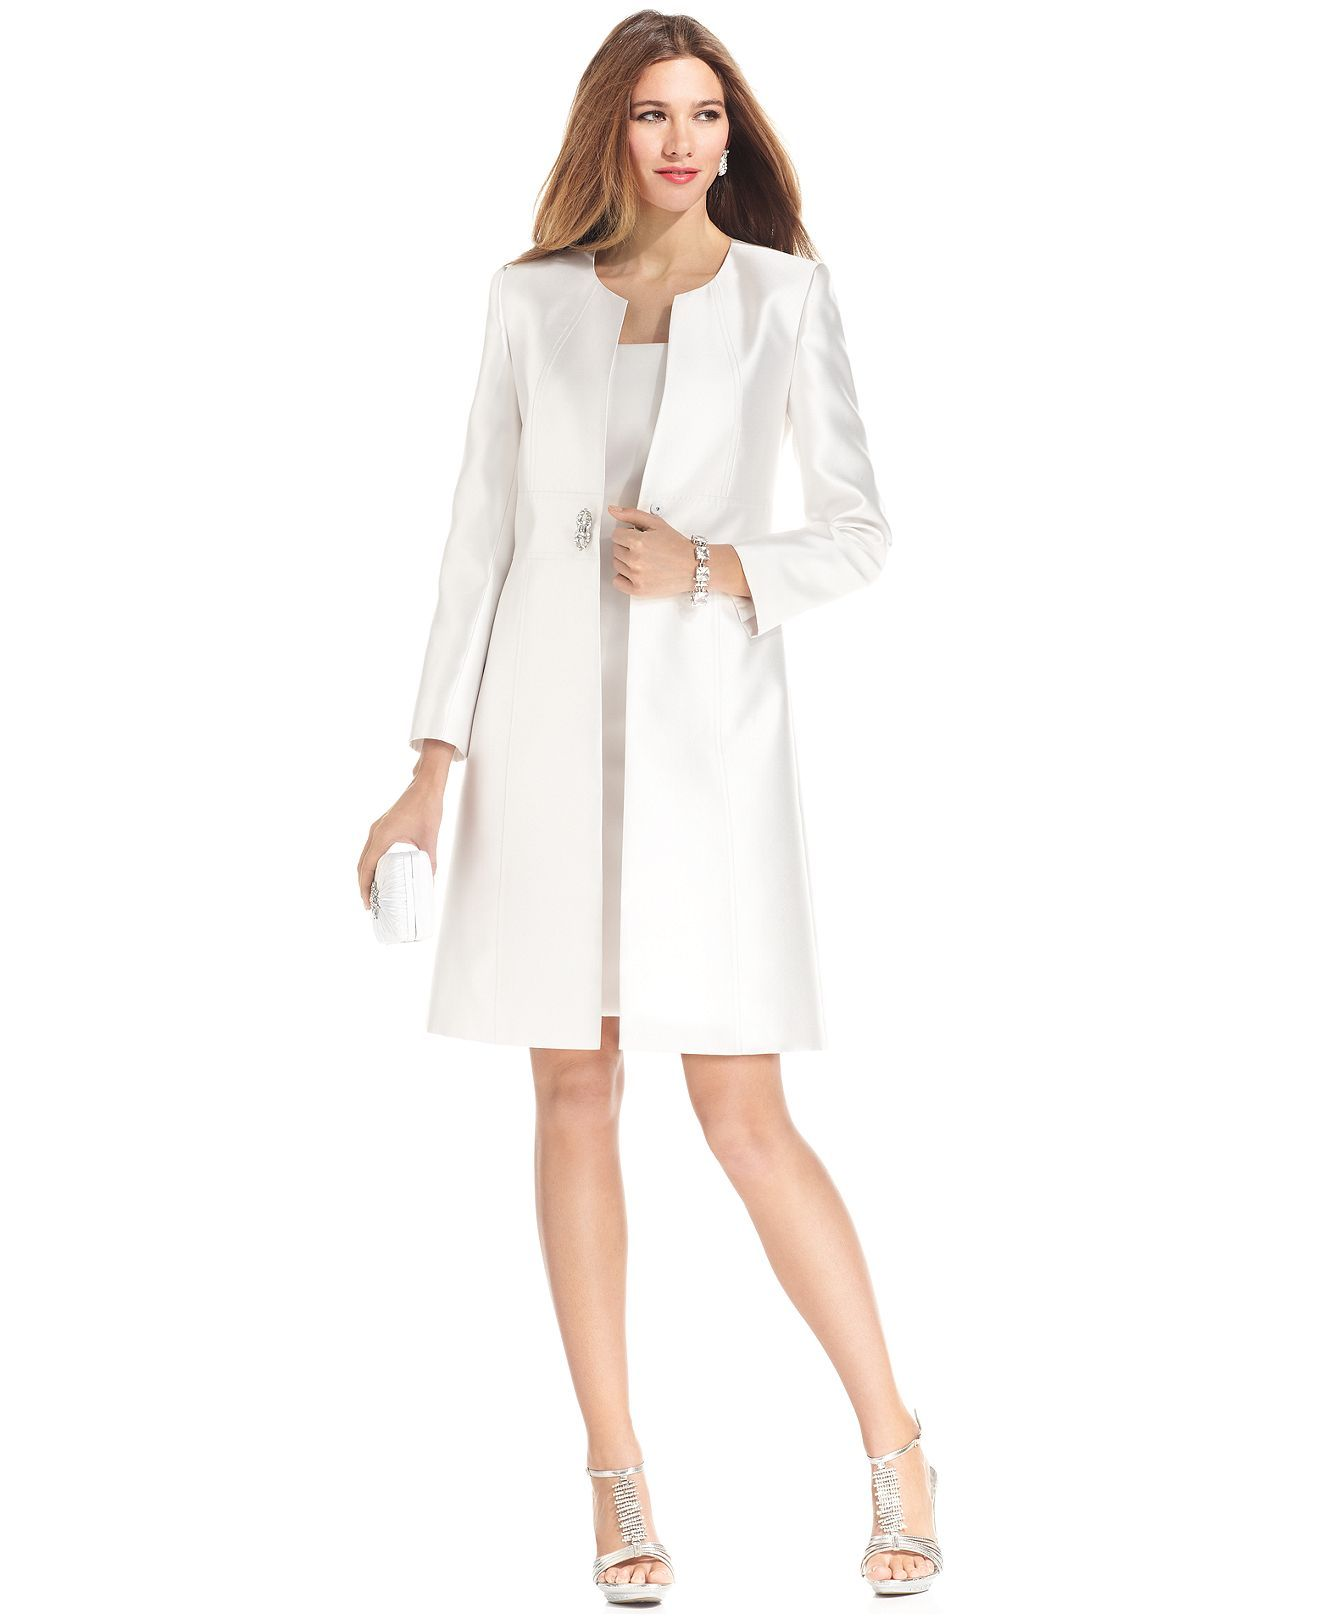 5206c9c8 Tahari by ASL Suit, Collarless Evening Jacket & Sheath Dress - Womens Suits  & Suit Separates - Macy's